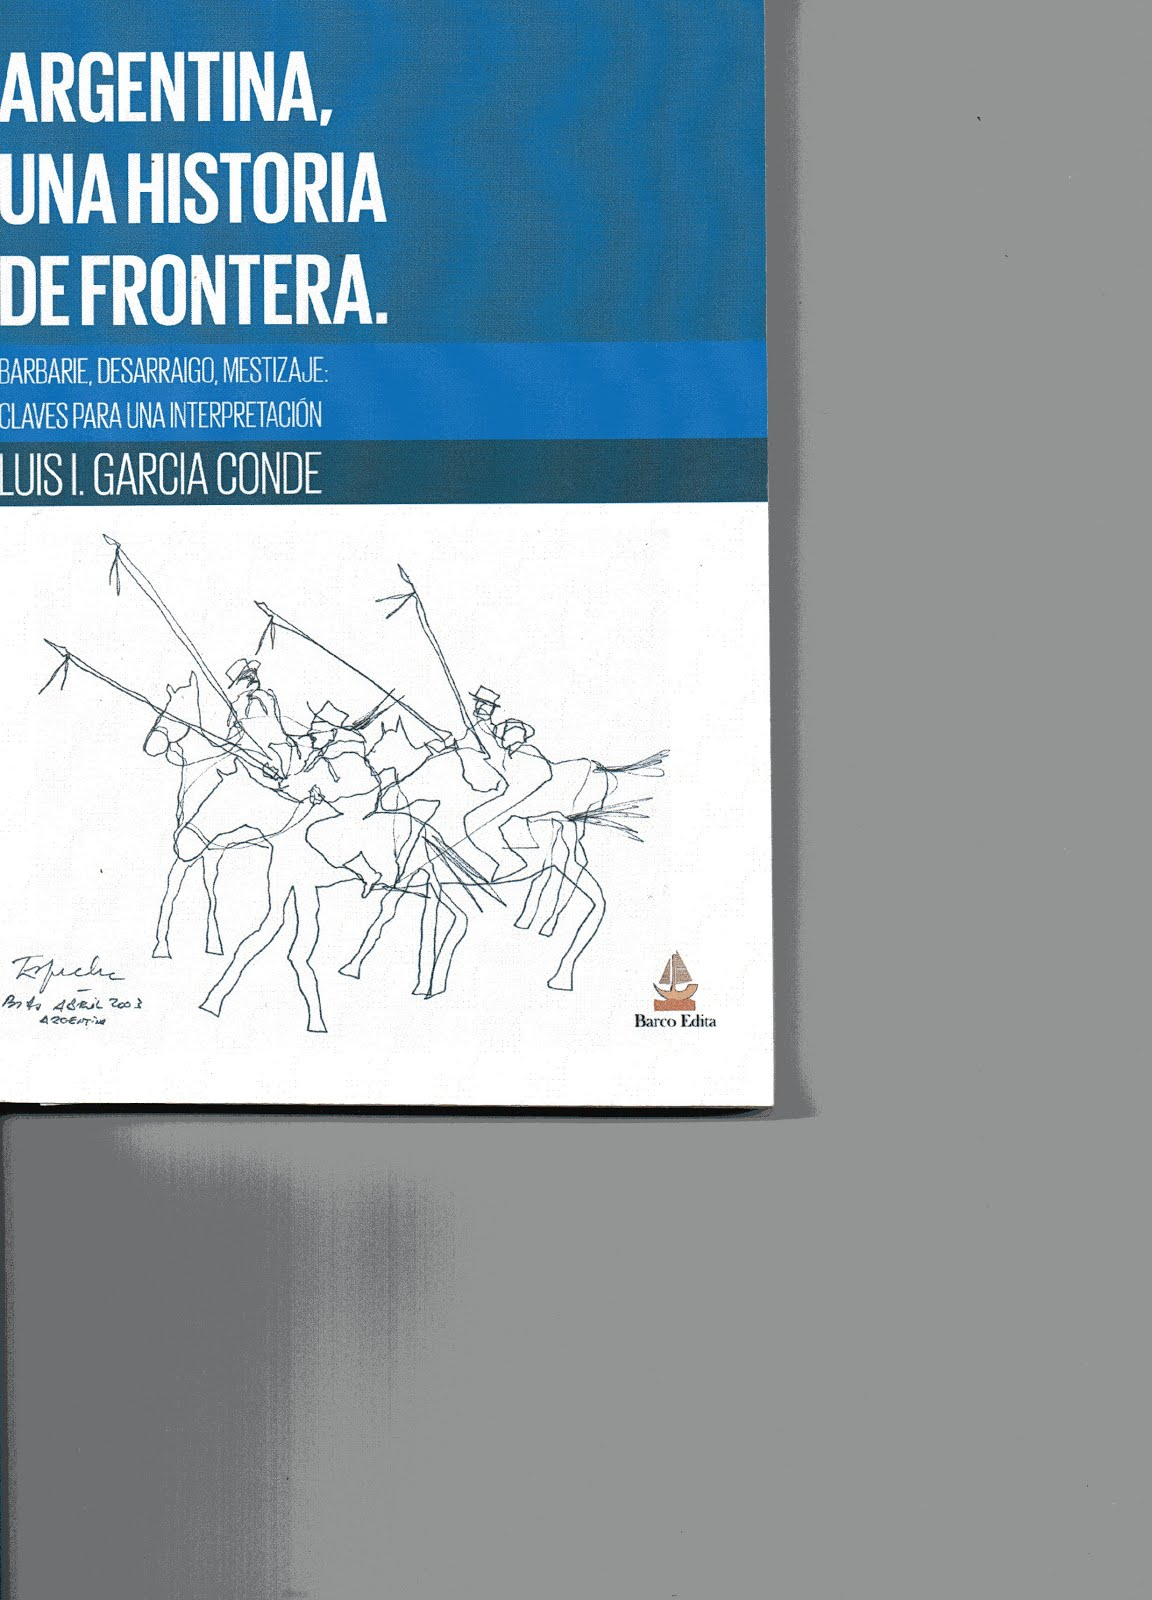 Argentina, una historia de frontera